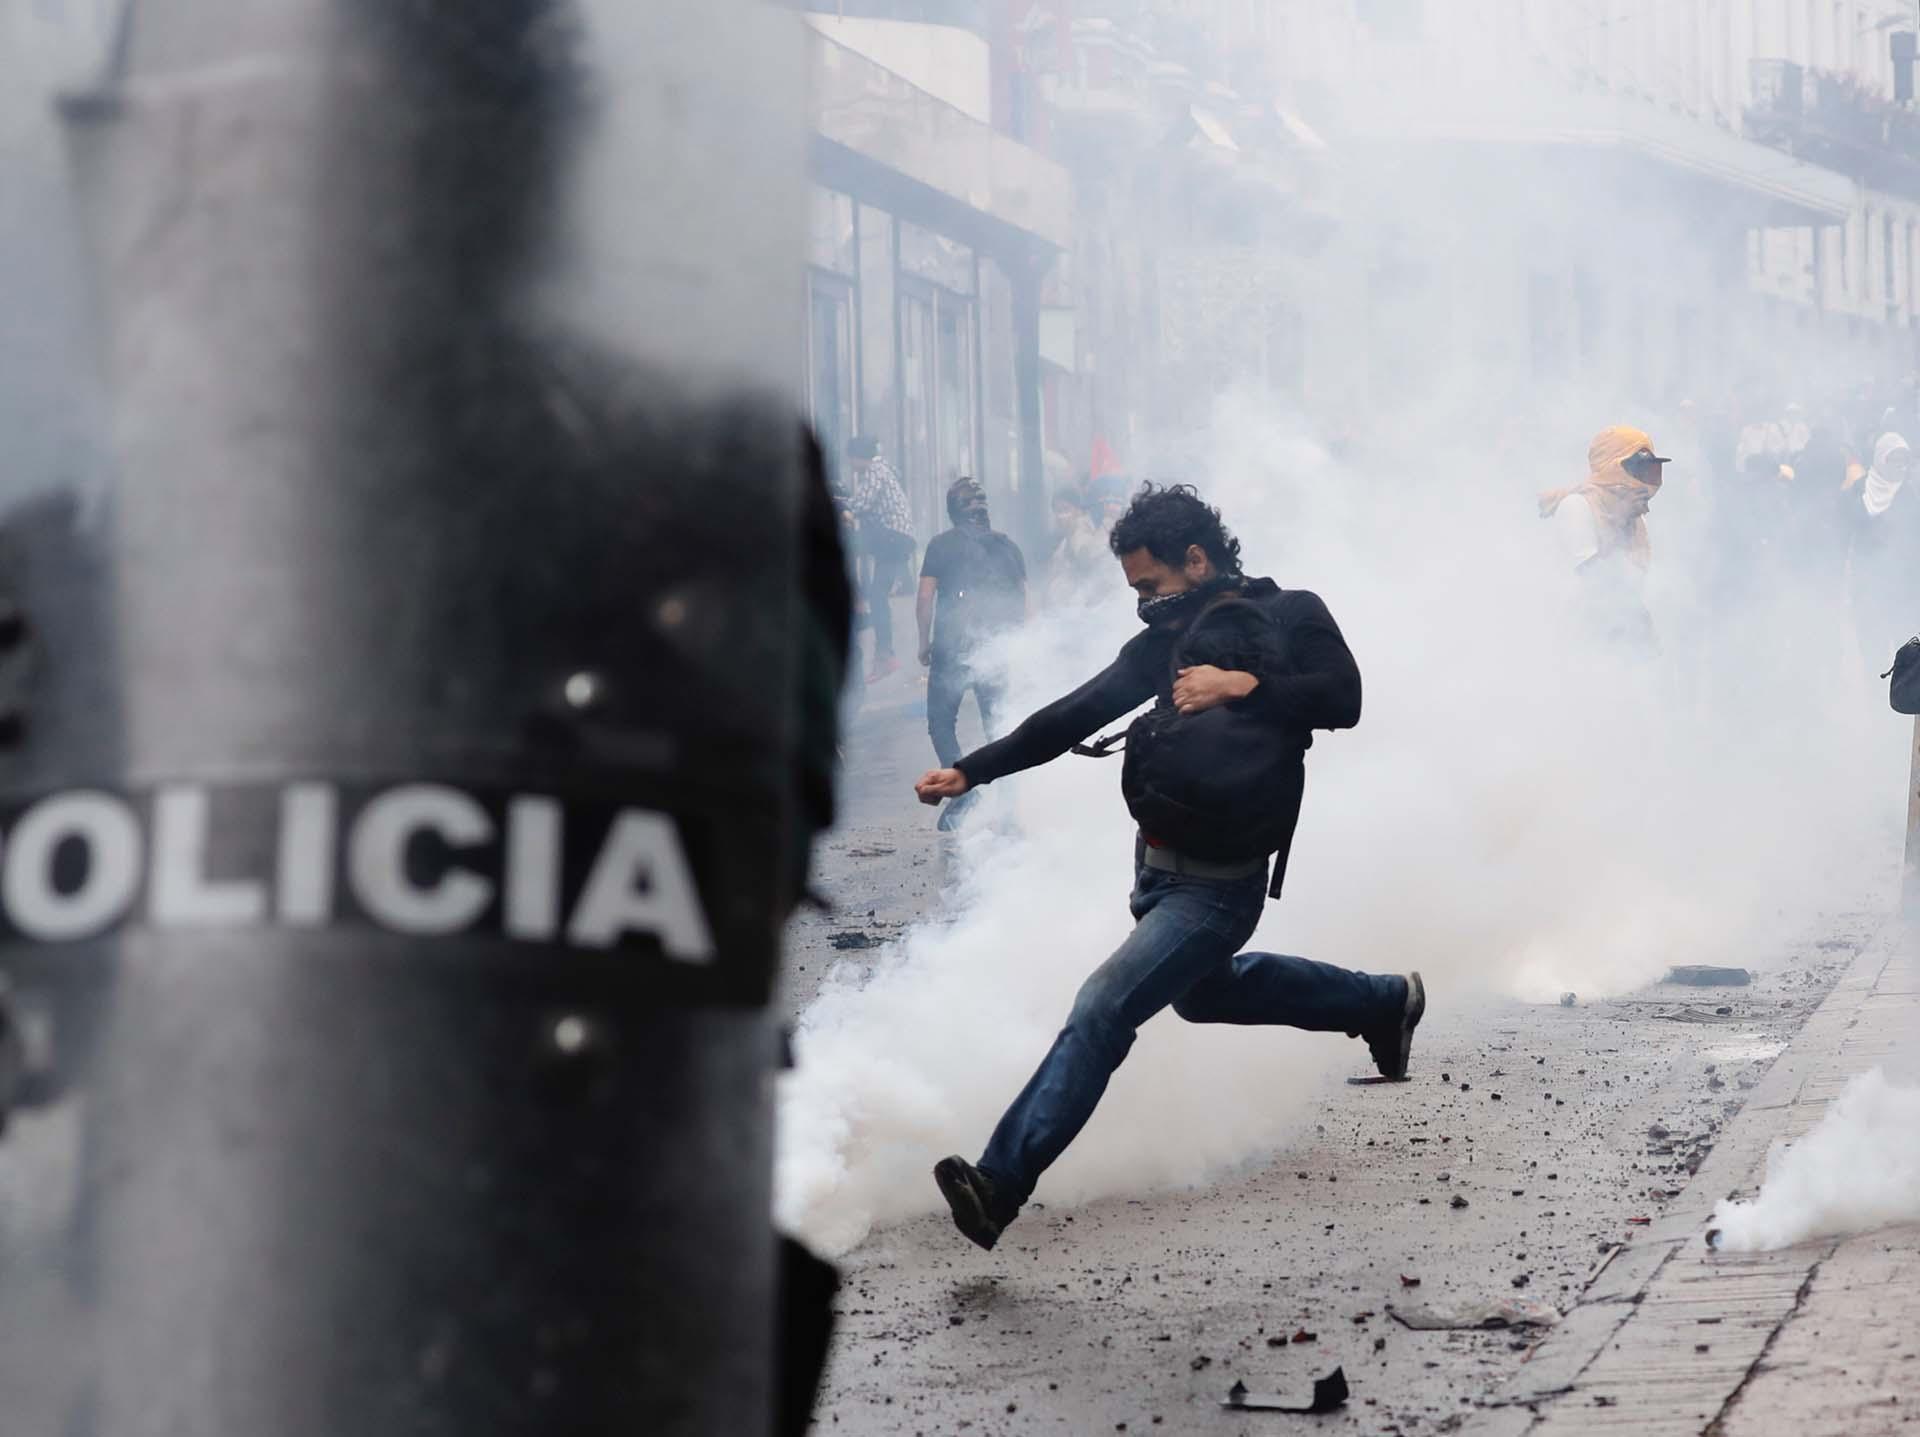 Un joven patea una bomba lacrimógena arrojada por la policía (AP Photo/Dolores Ochoa)